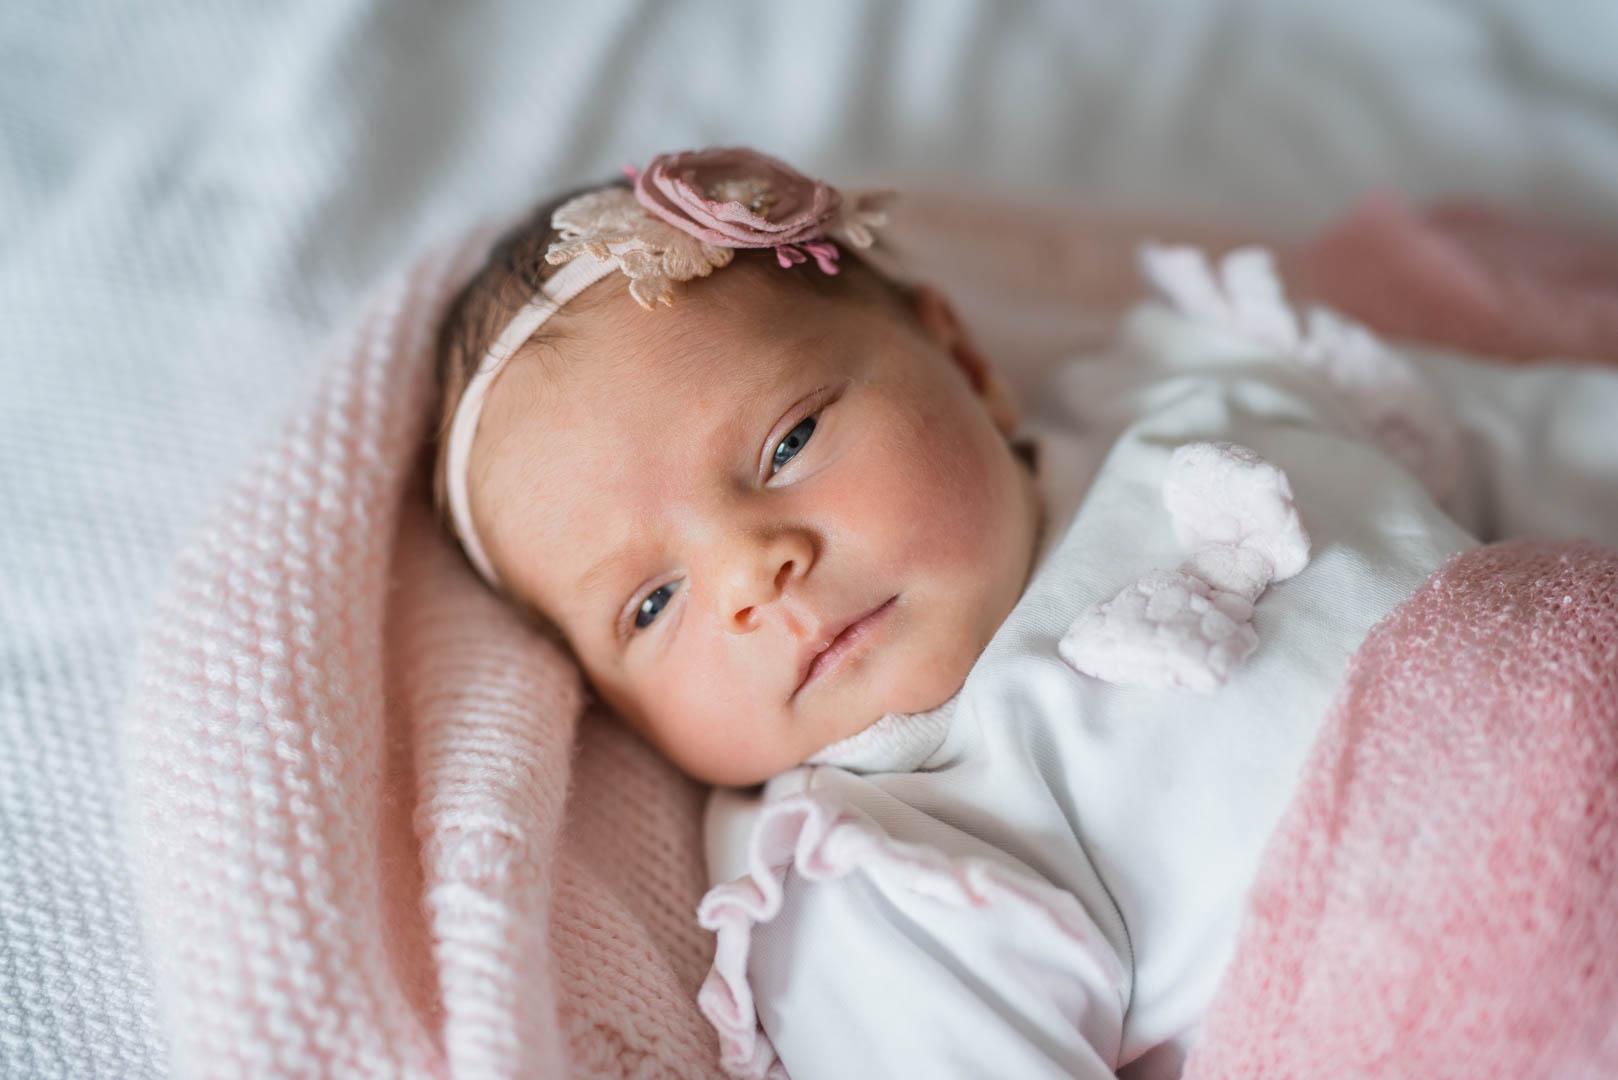 Babyfoto mit wachem Baby